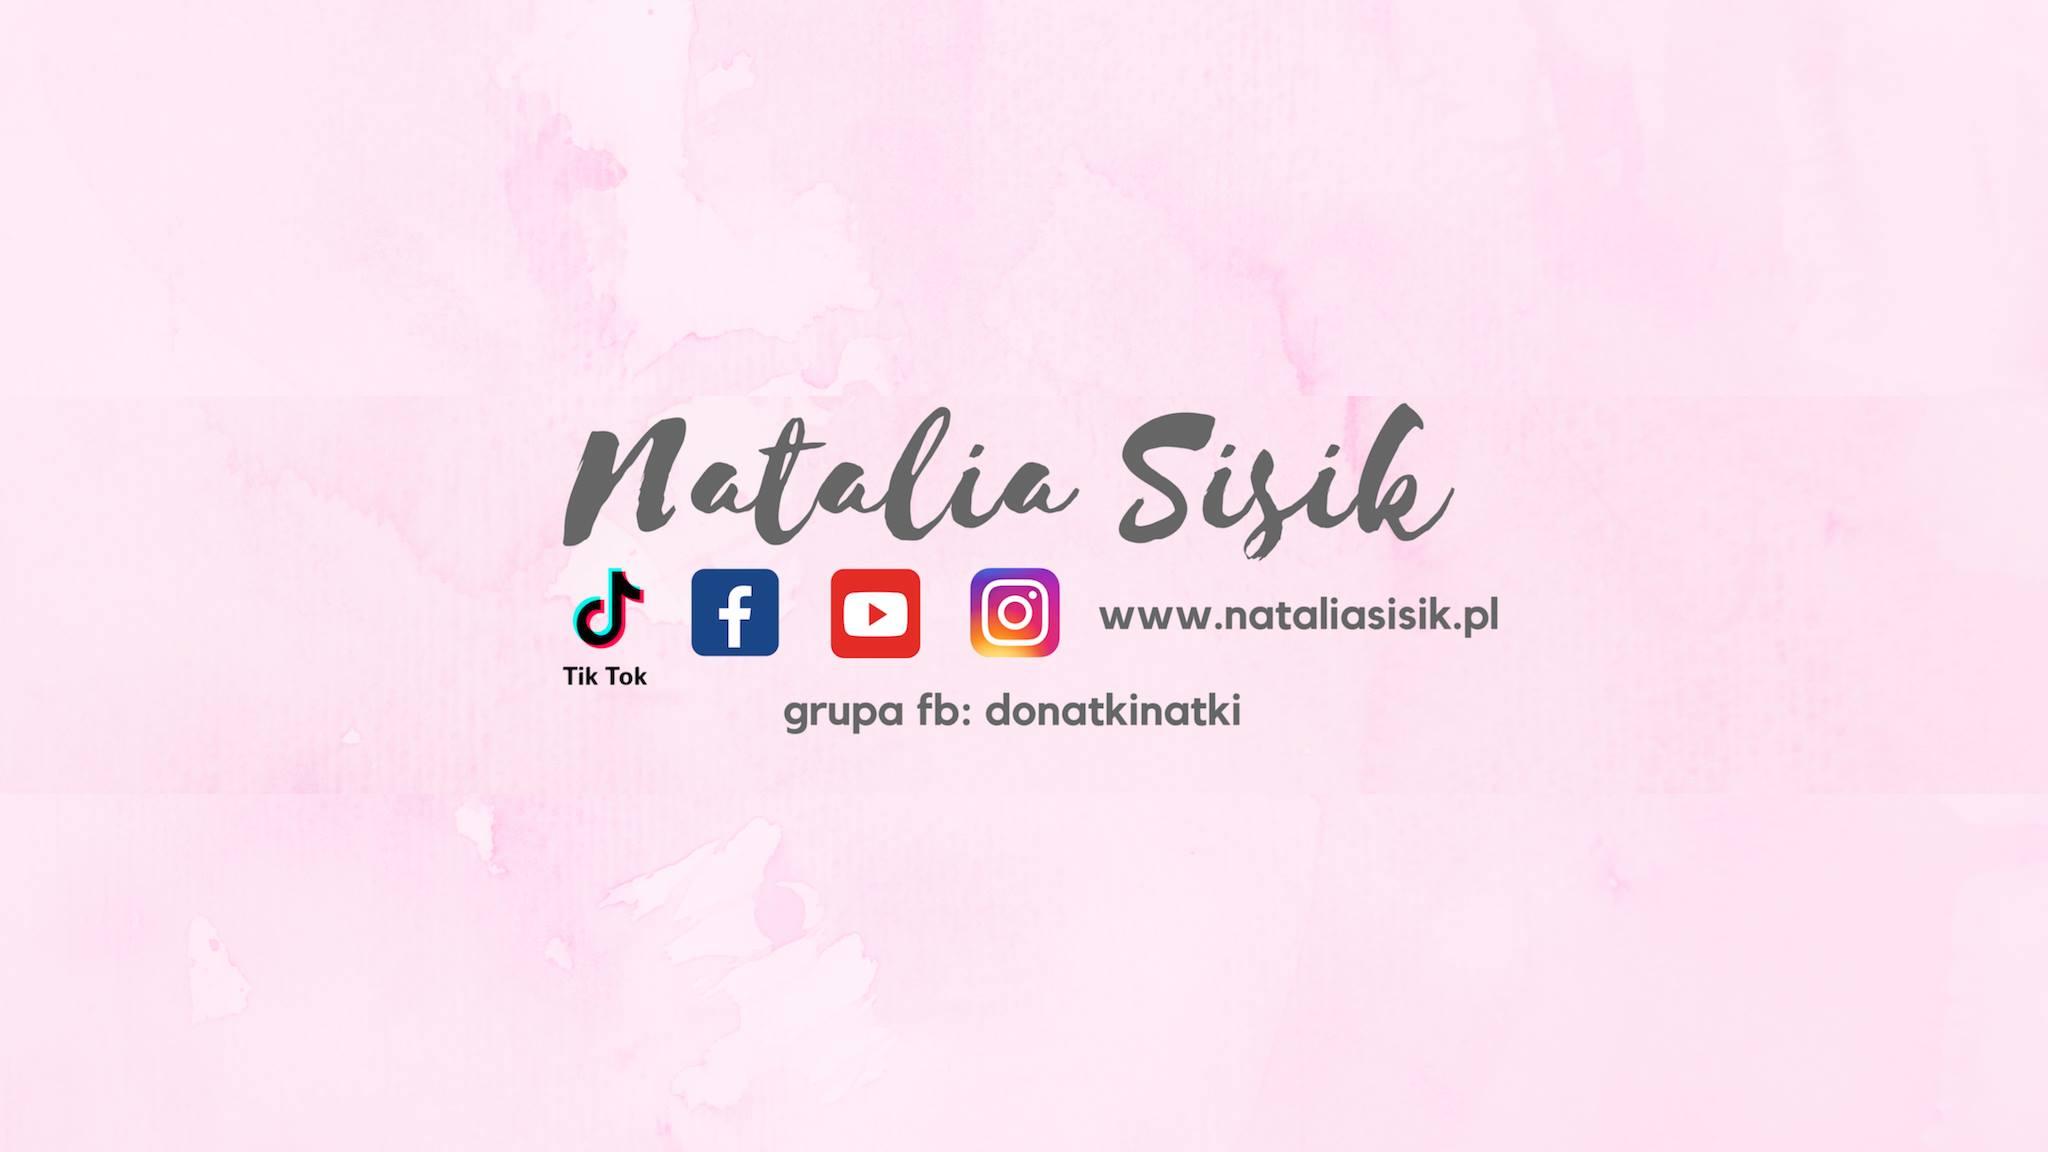 NataliaSisik